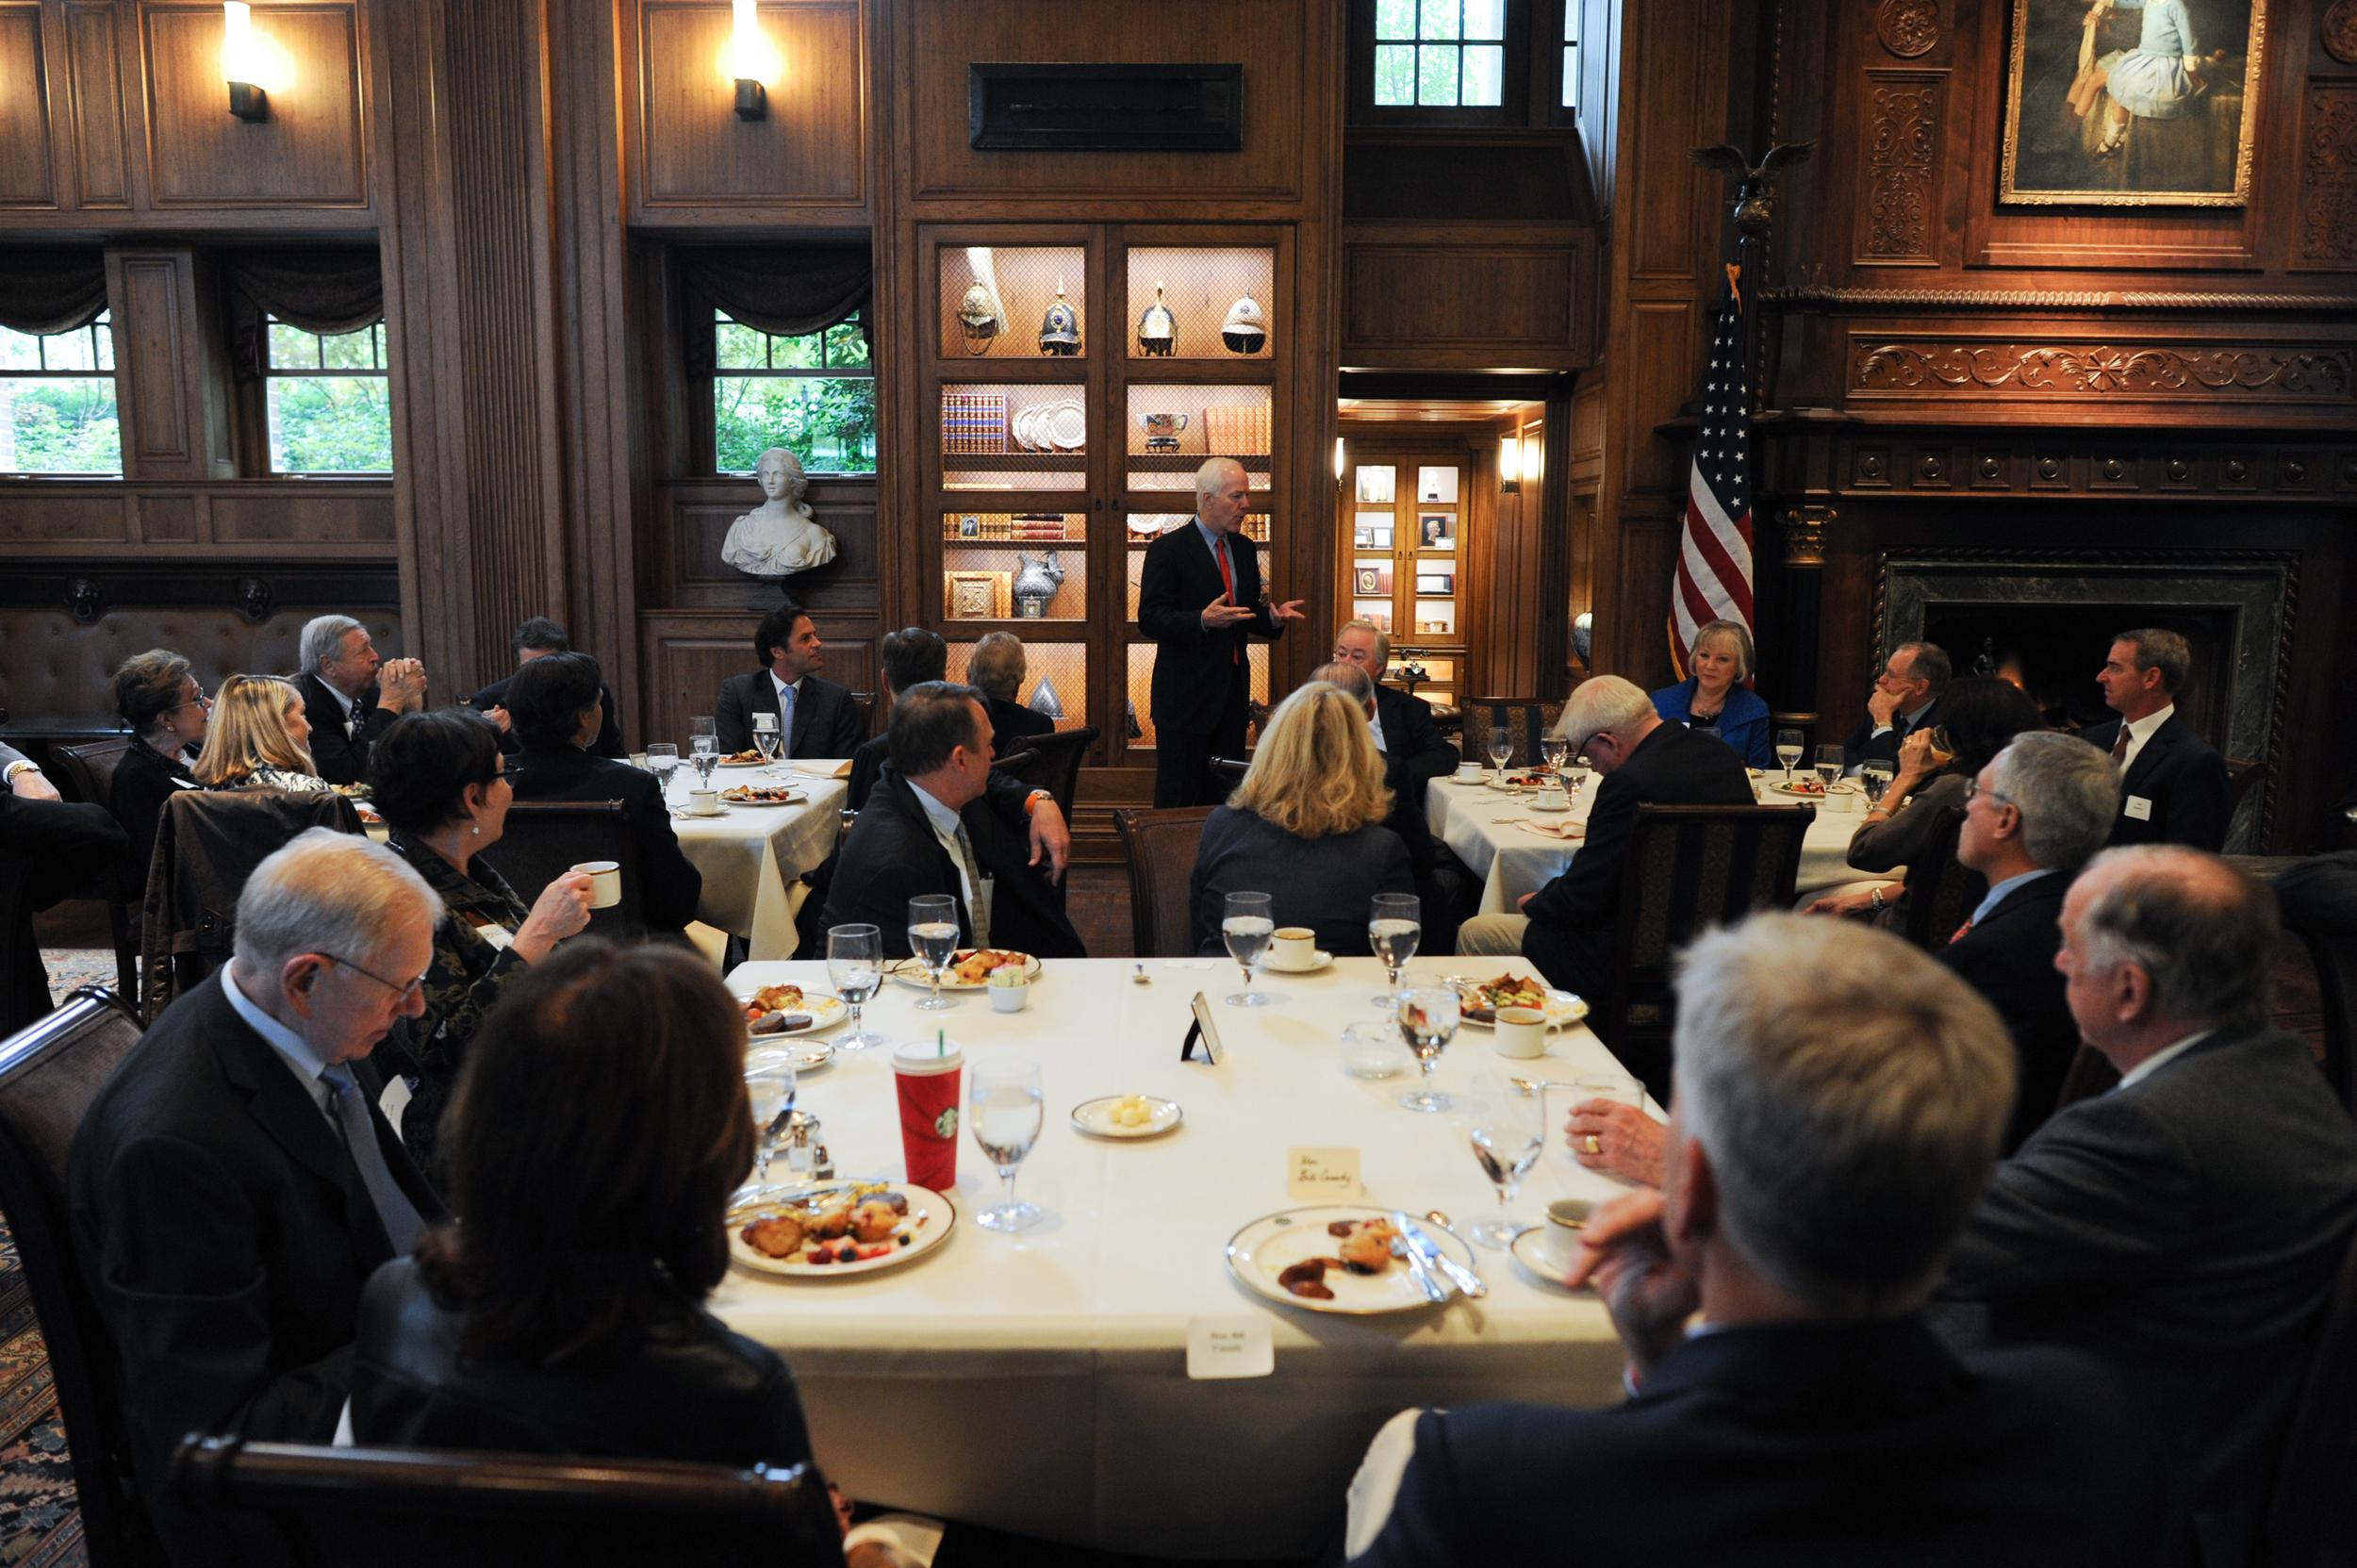 Senator John Cornyn speaks at the Senate Battleground Fund Breakfast in November 2014.